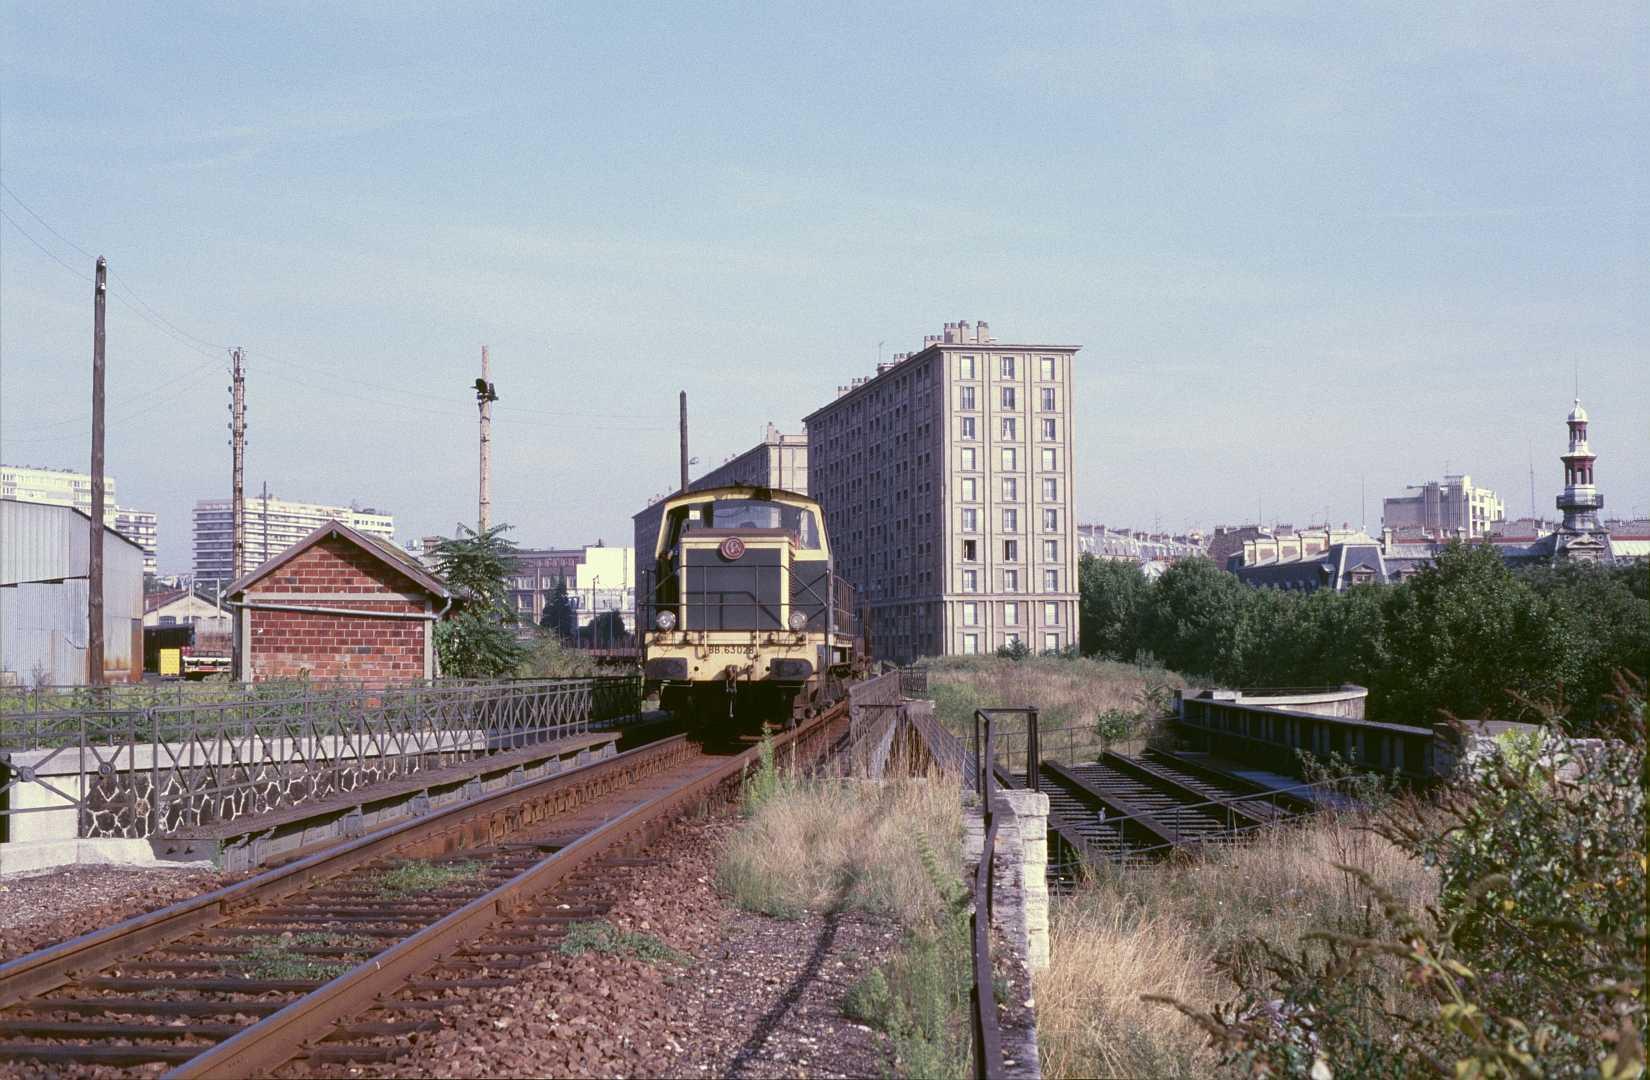 La gare de marchandises de Reuilly en septembre 1985